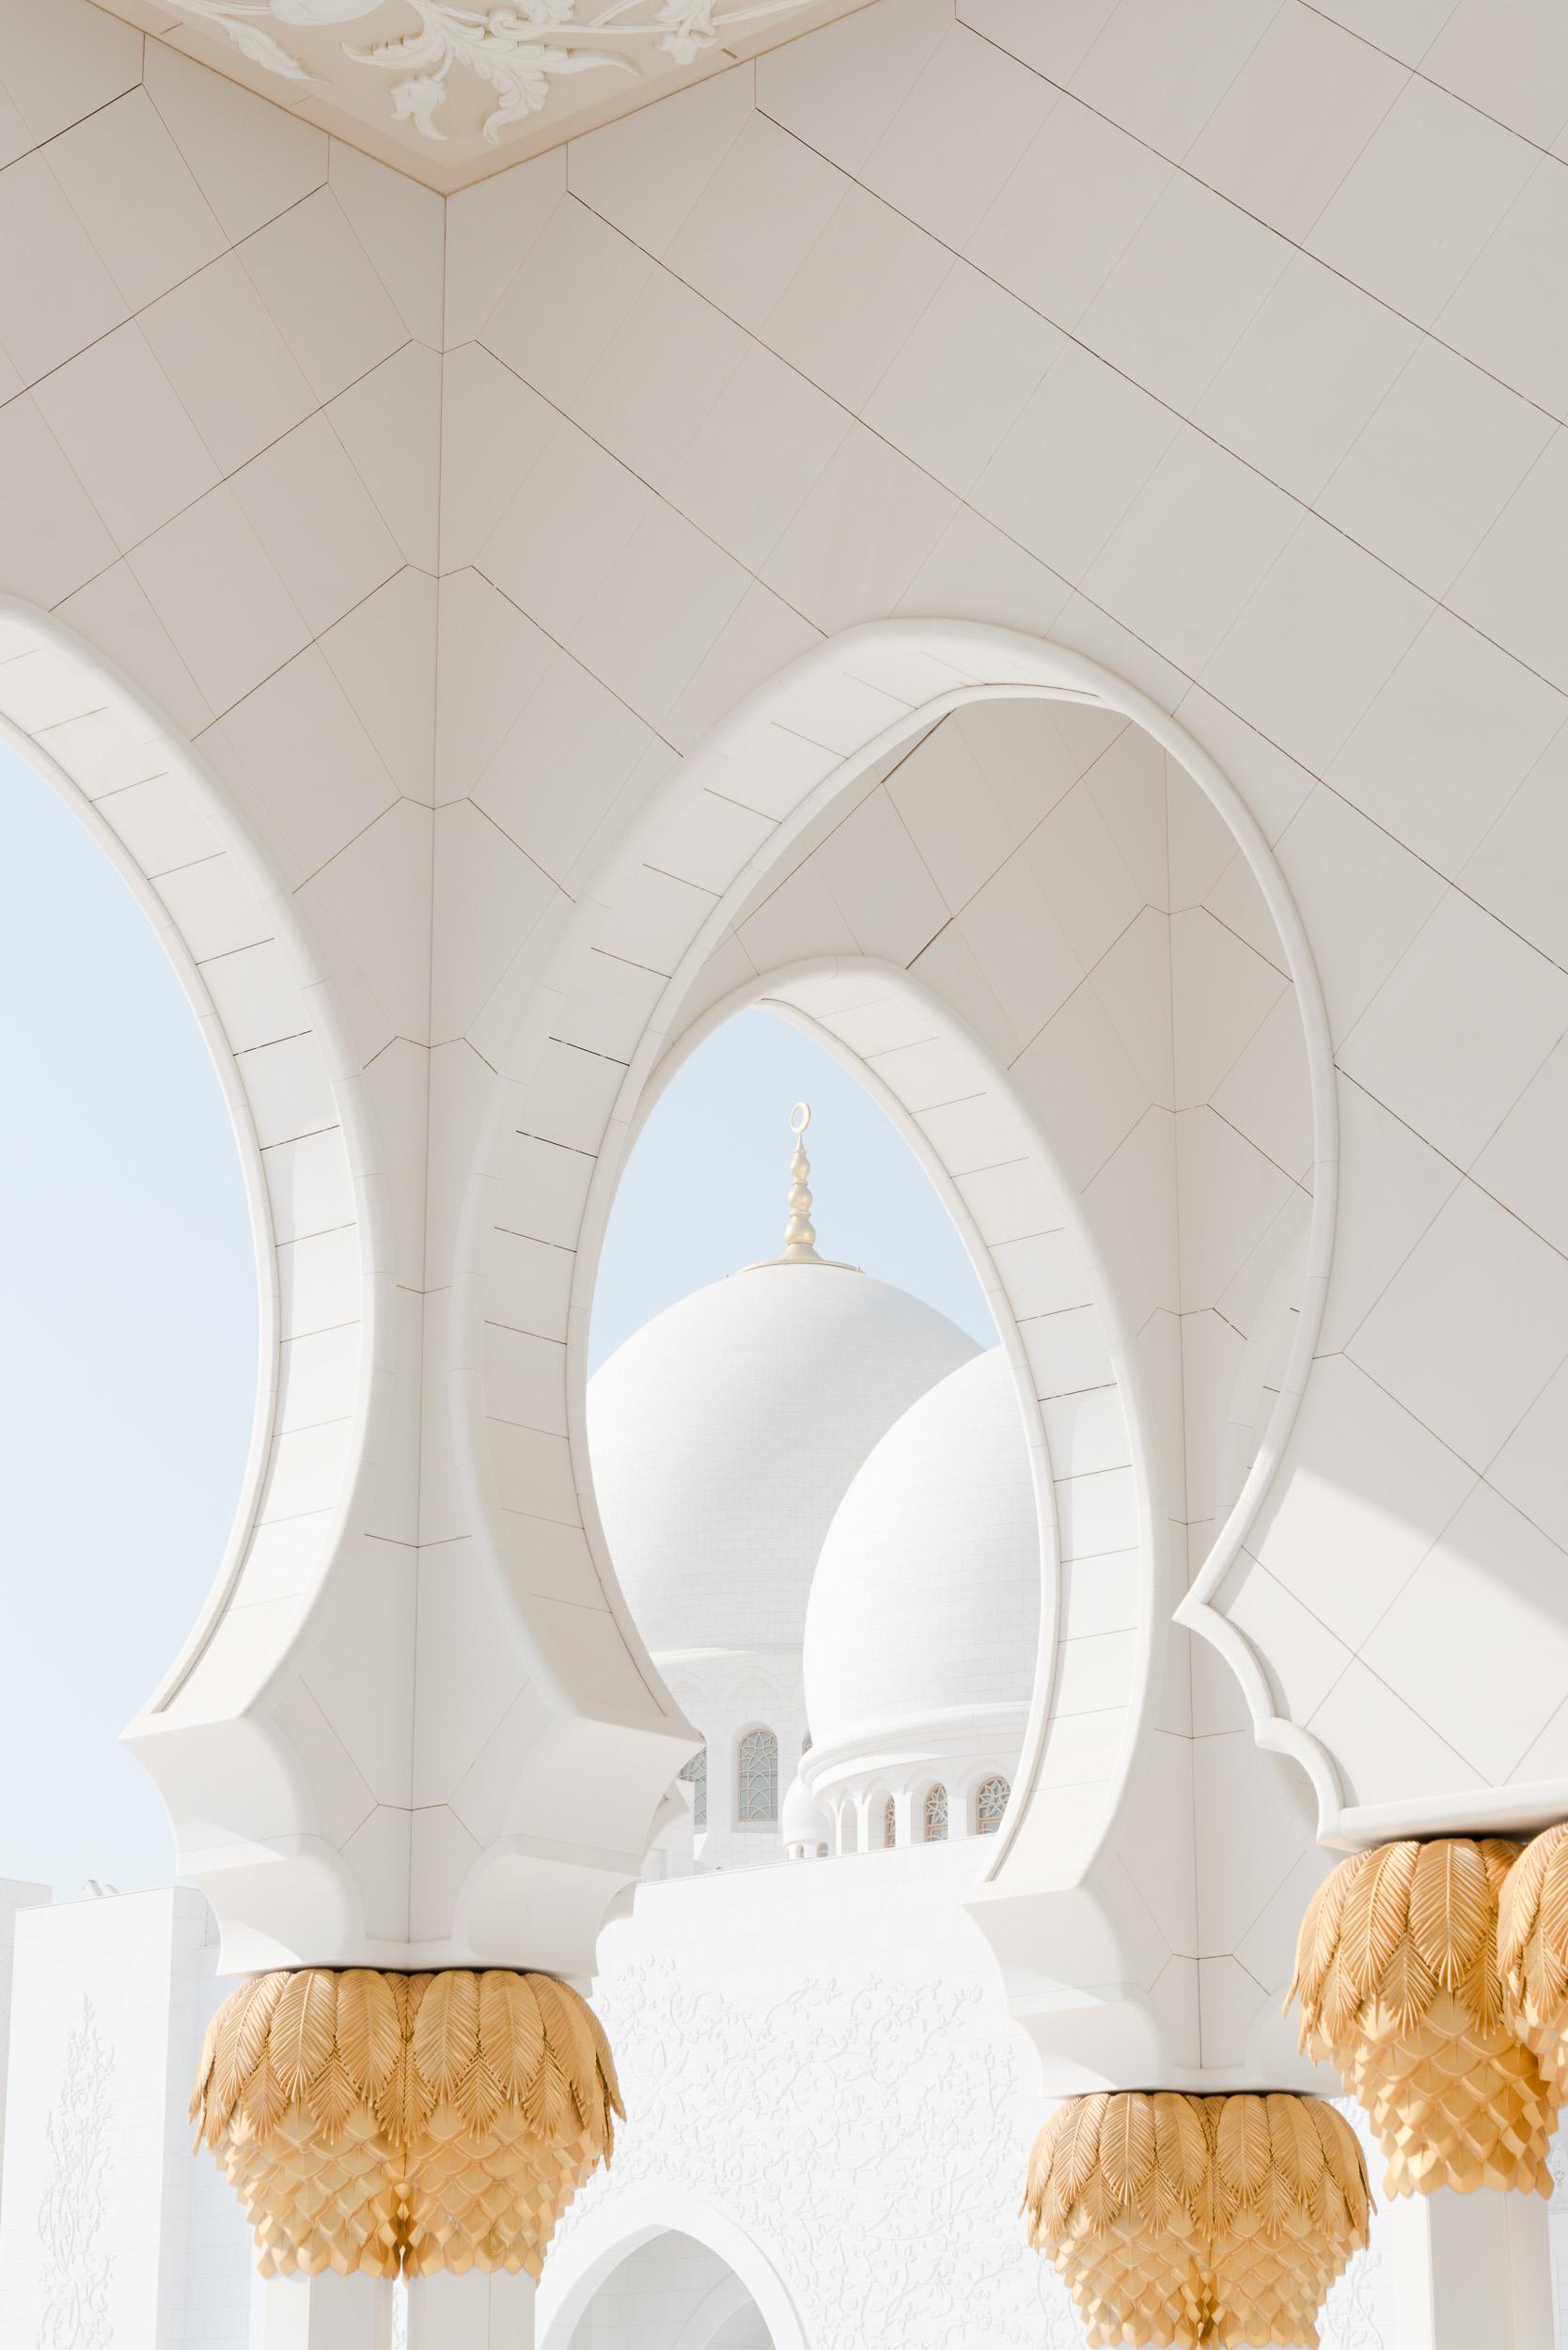 the_getaway_edit_abu_dhabi_sheikh_zayed_grand_mosque-5.jpg